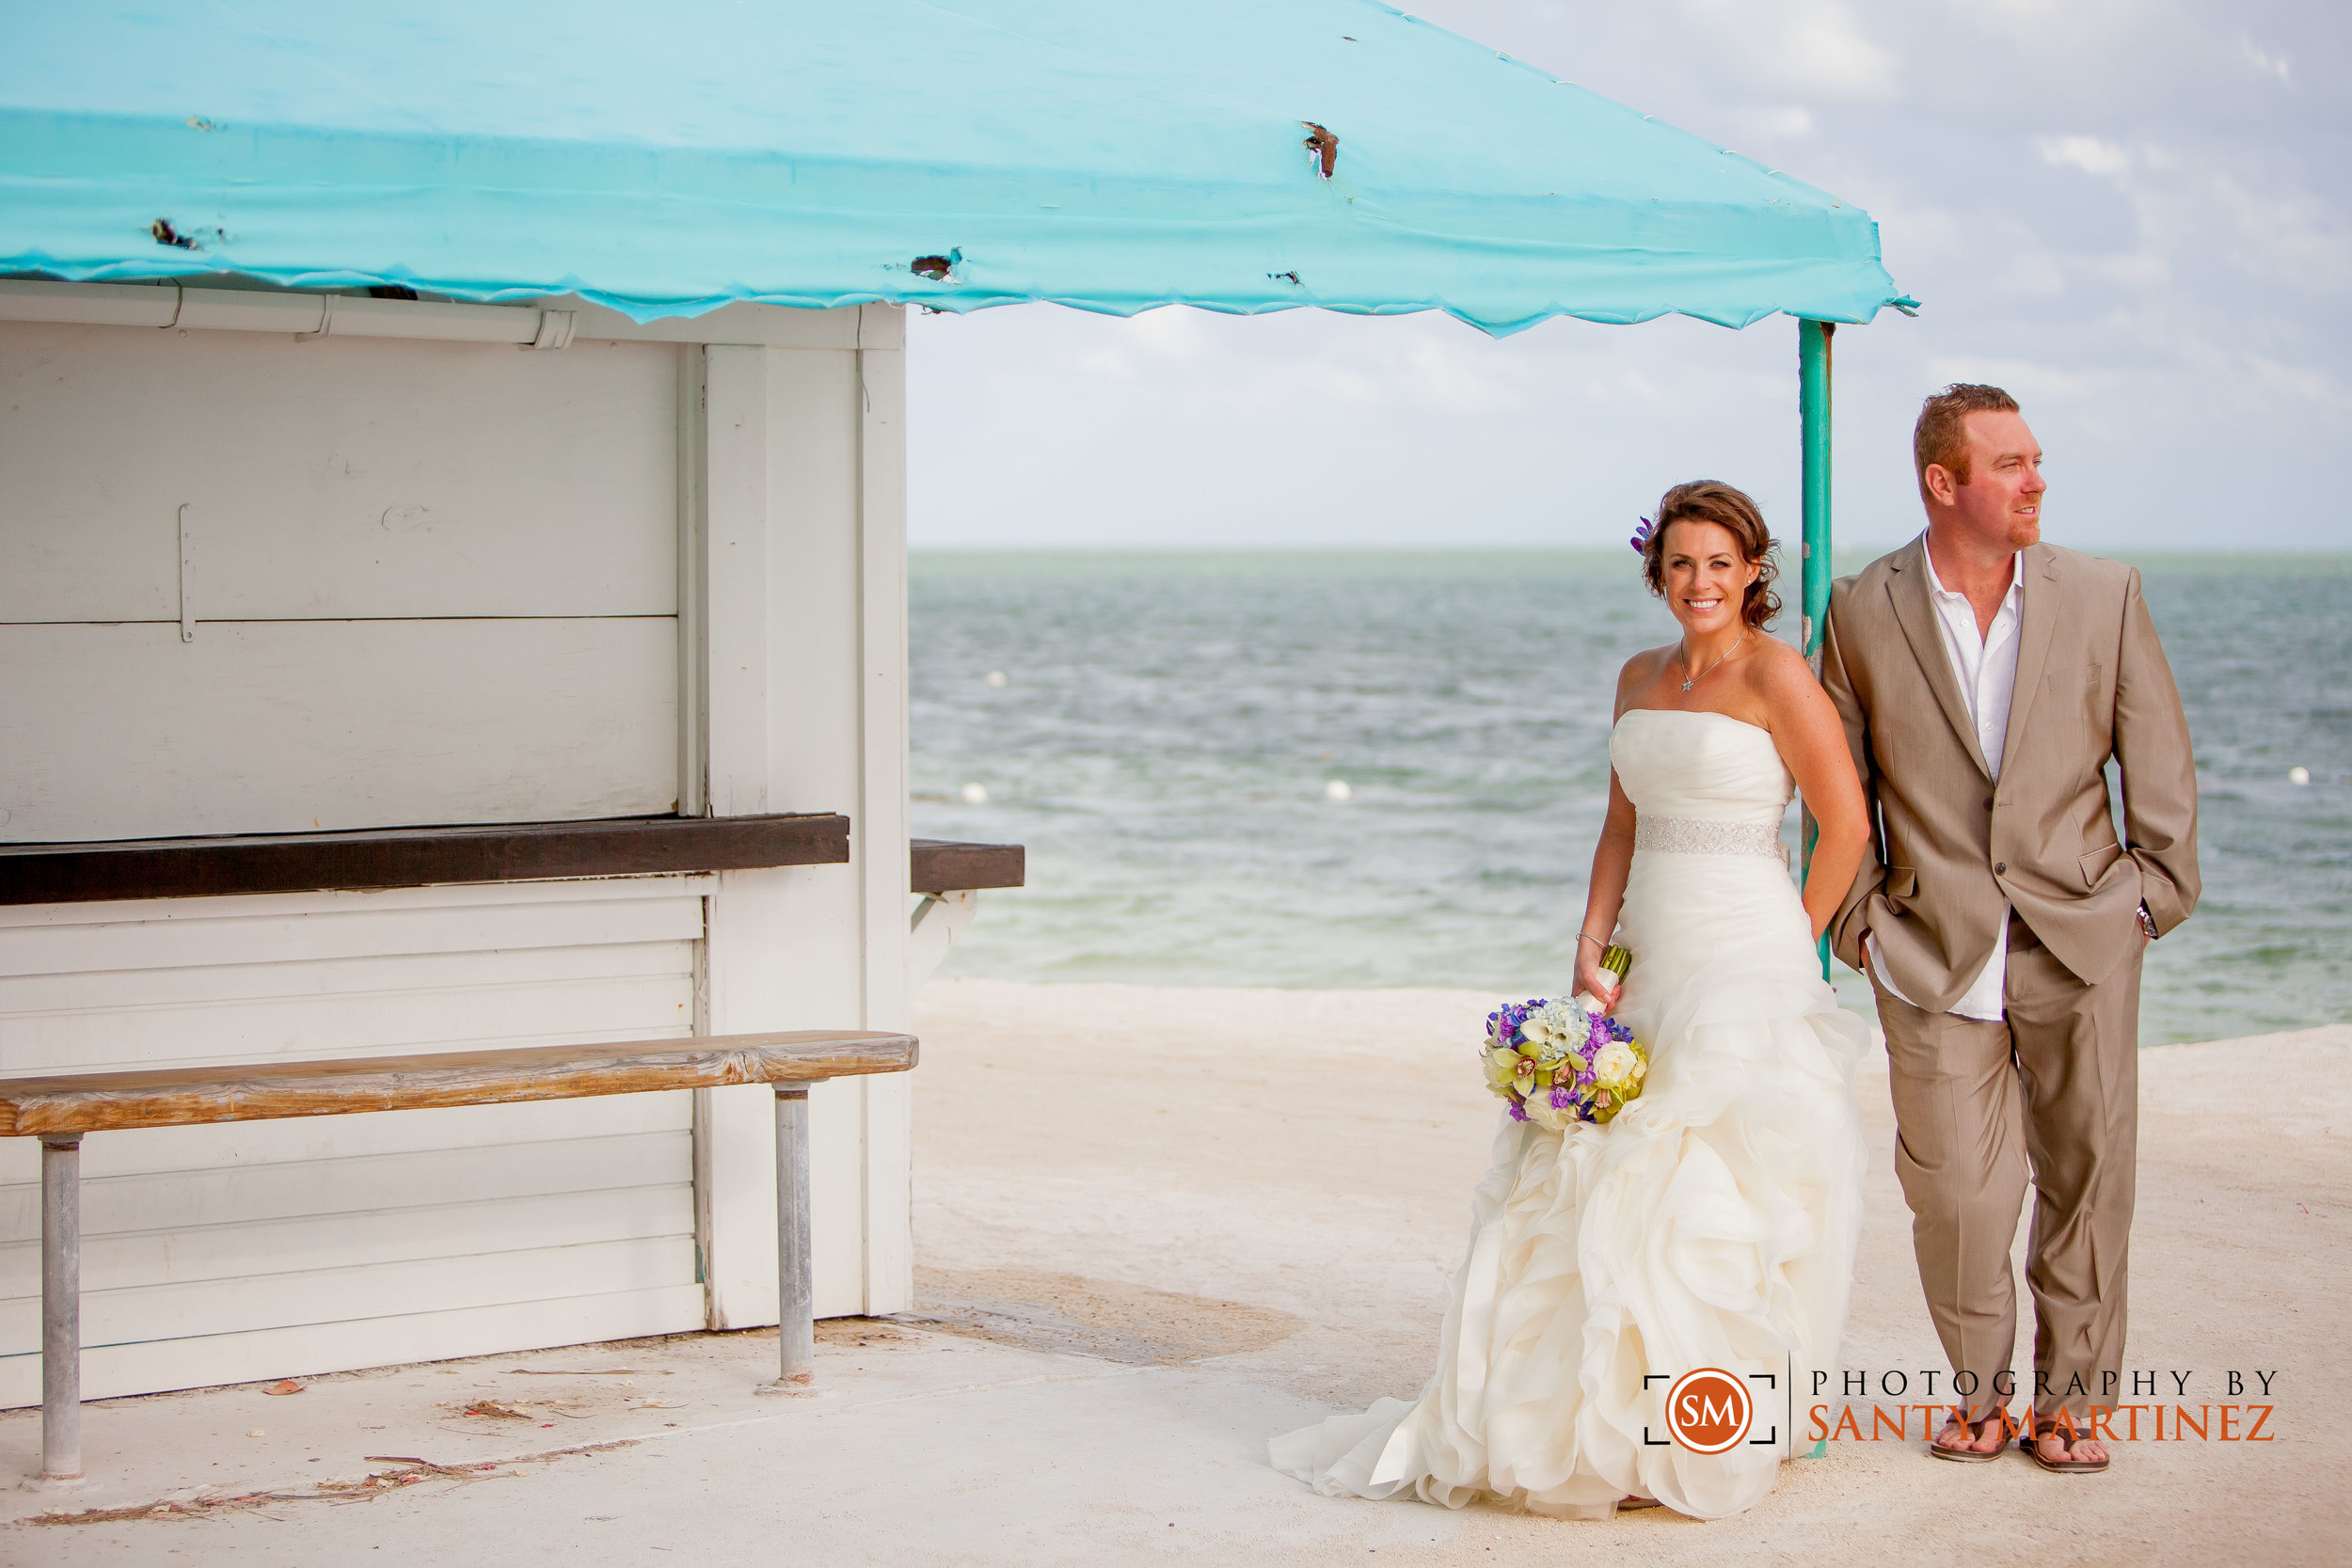 Photography by Santy Martinez - Miami Wedding Photographer-019.jpg